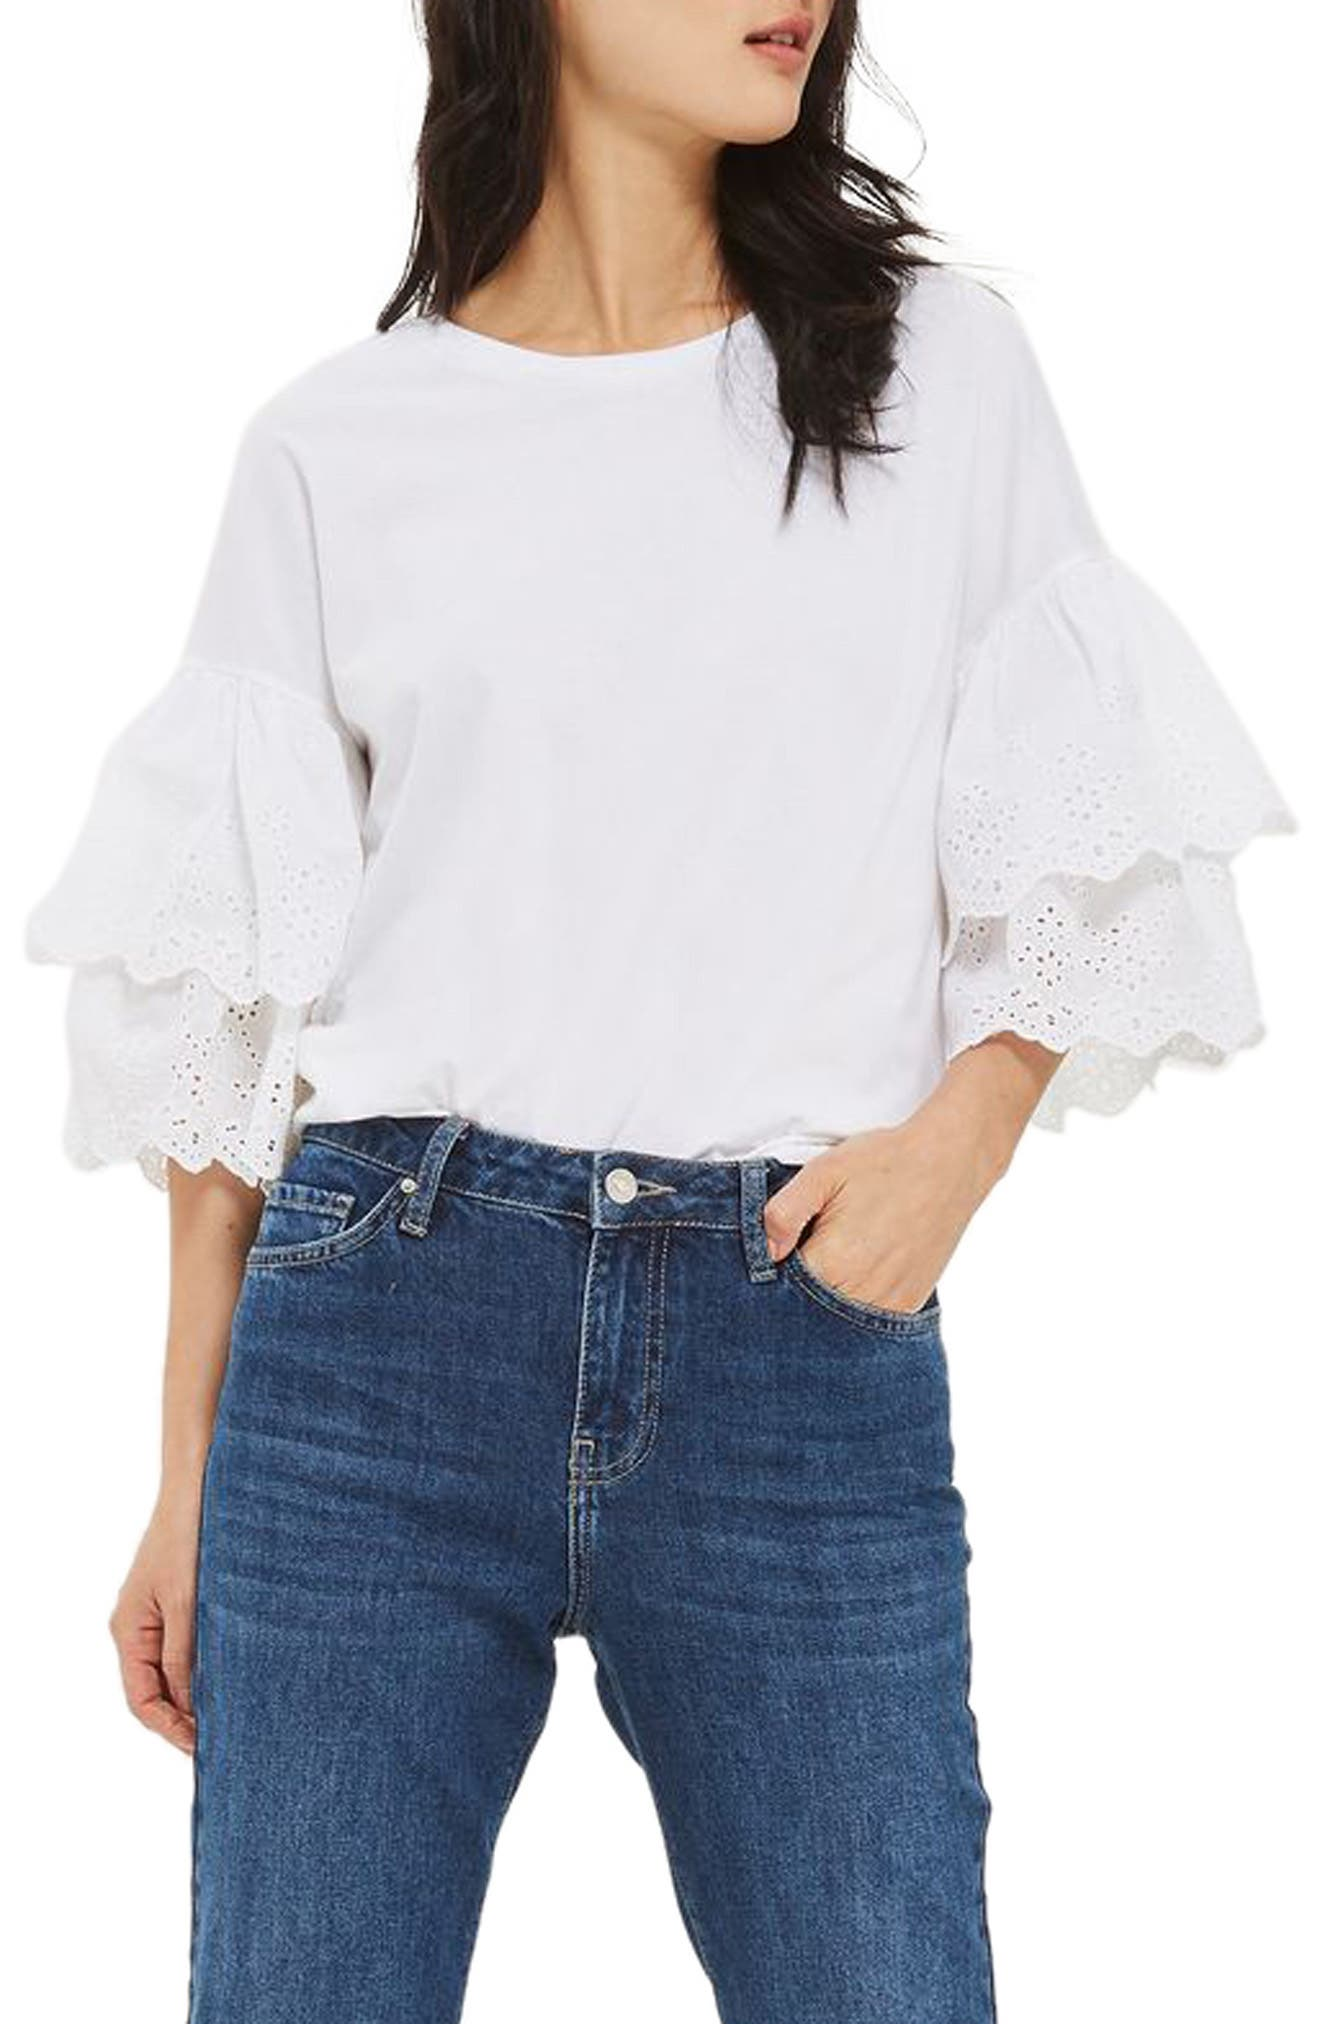 Topshop Eyelet Layer Sleeve Tee T-Shirt (Regular & Petite)